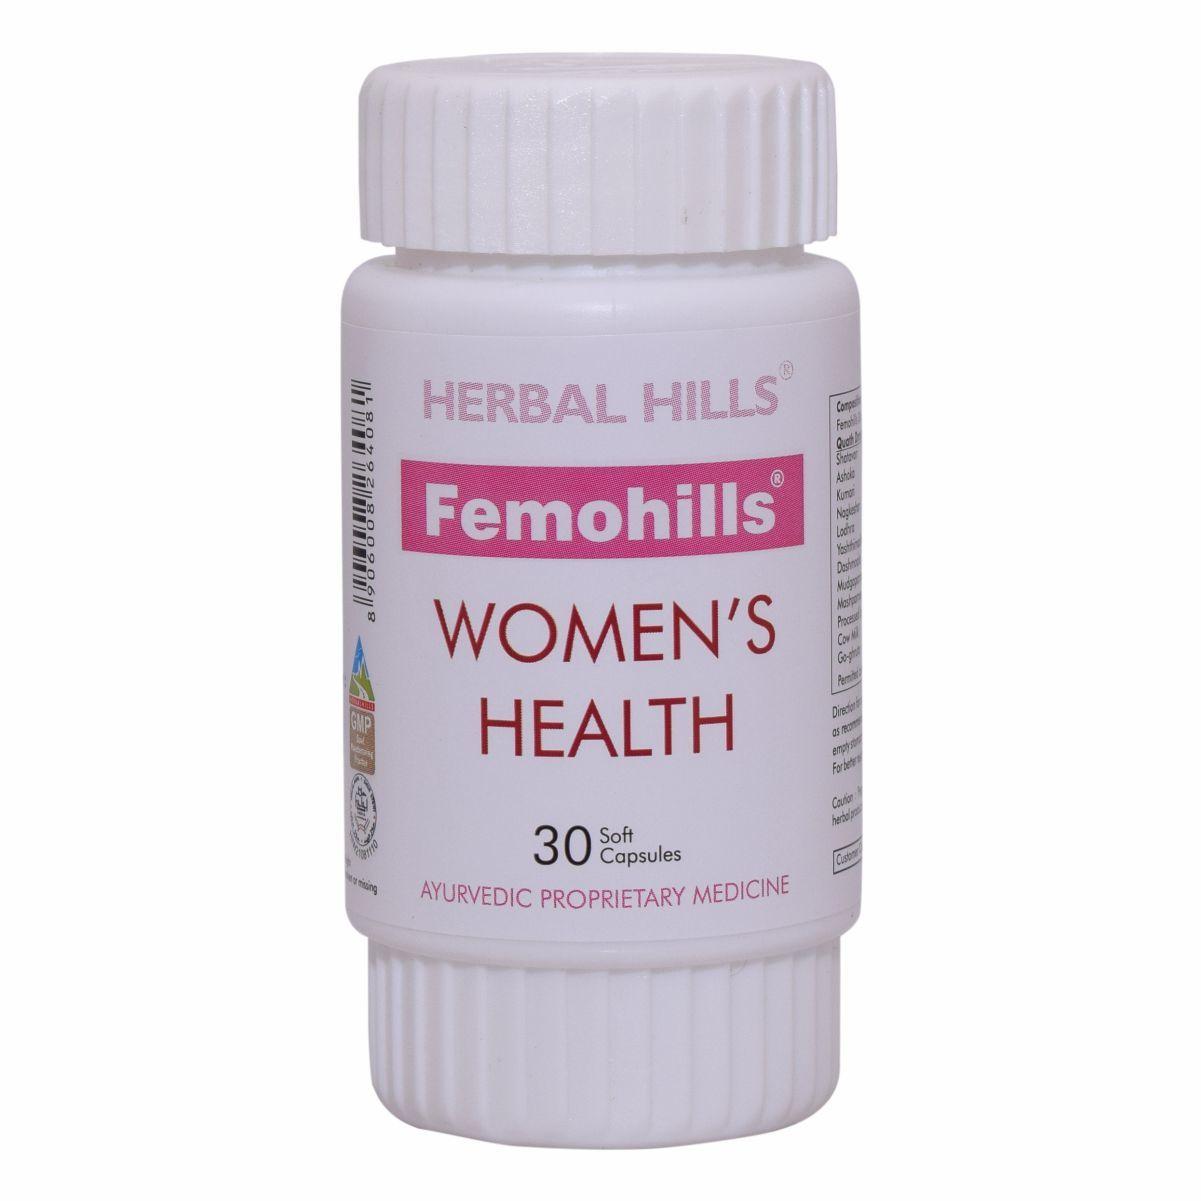 Best Ayurvedic Medicine for Women's Health - Femohills 30 capsule